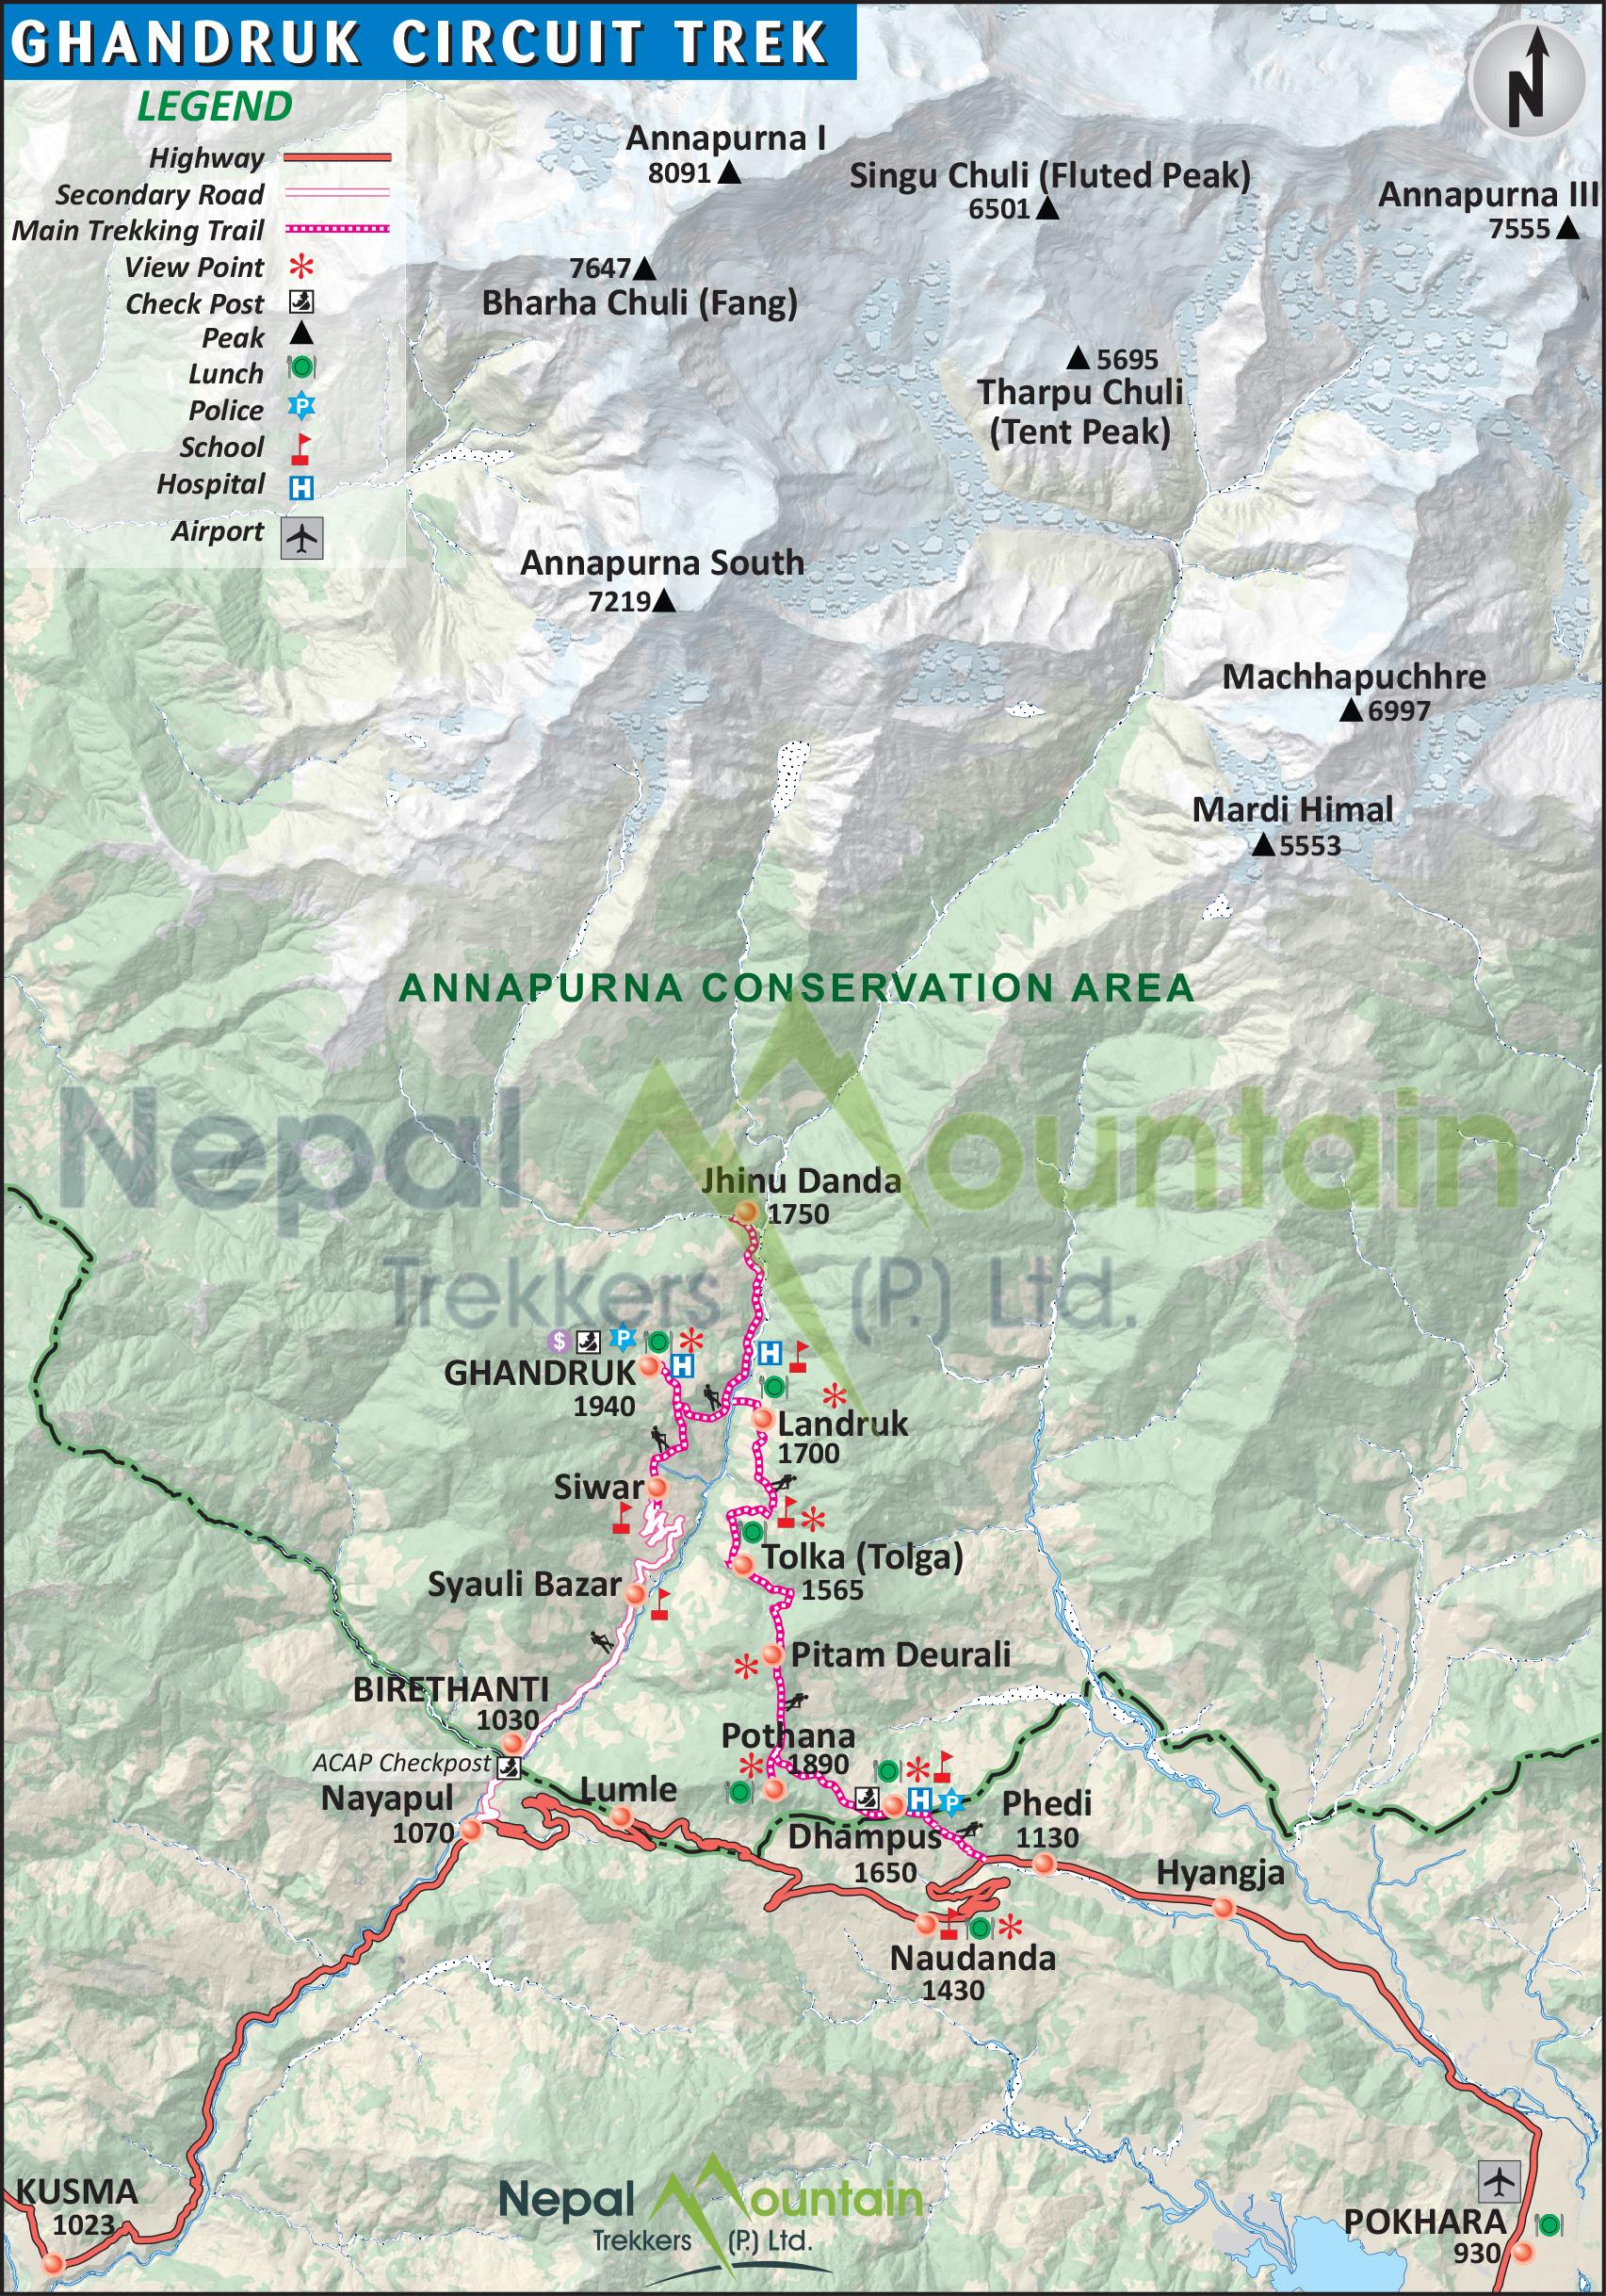 map of Ghandruk Circuit Trek